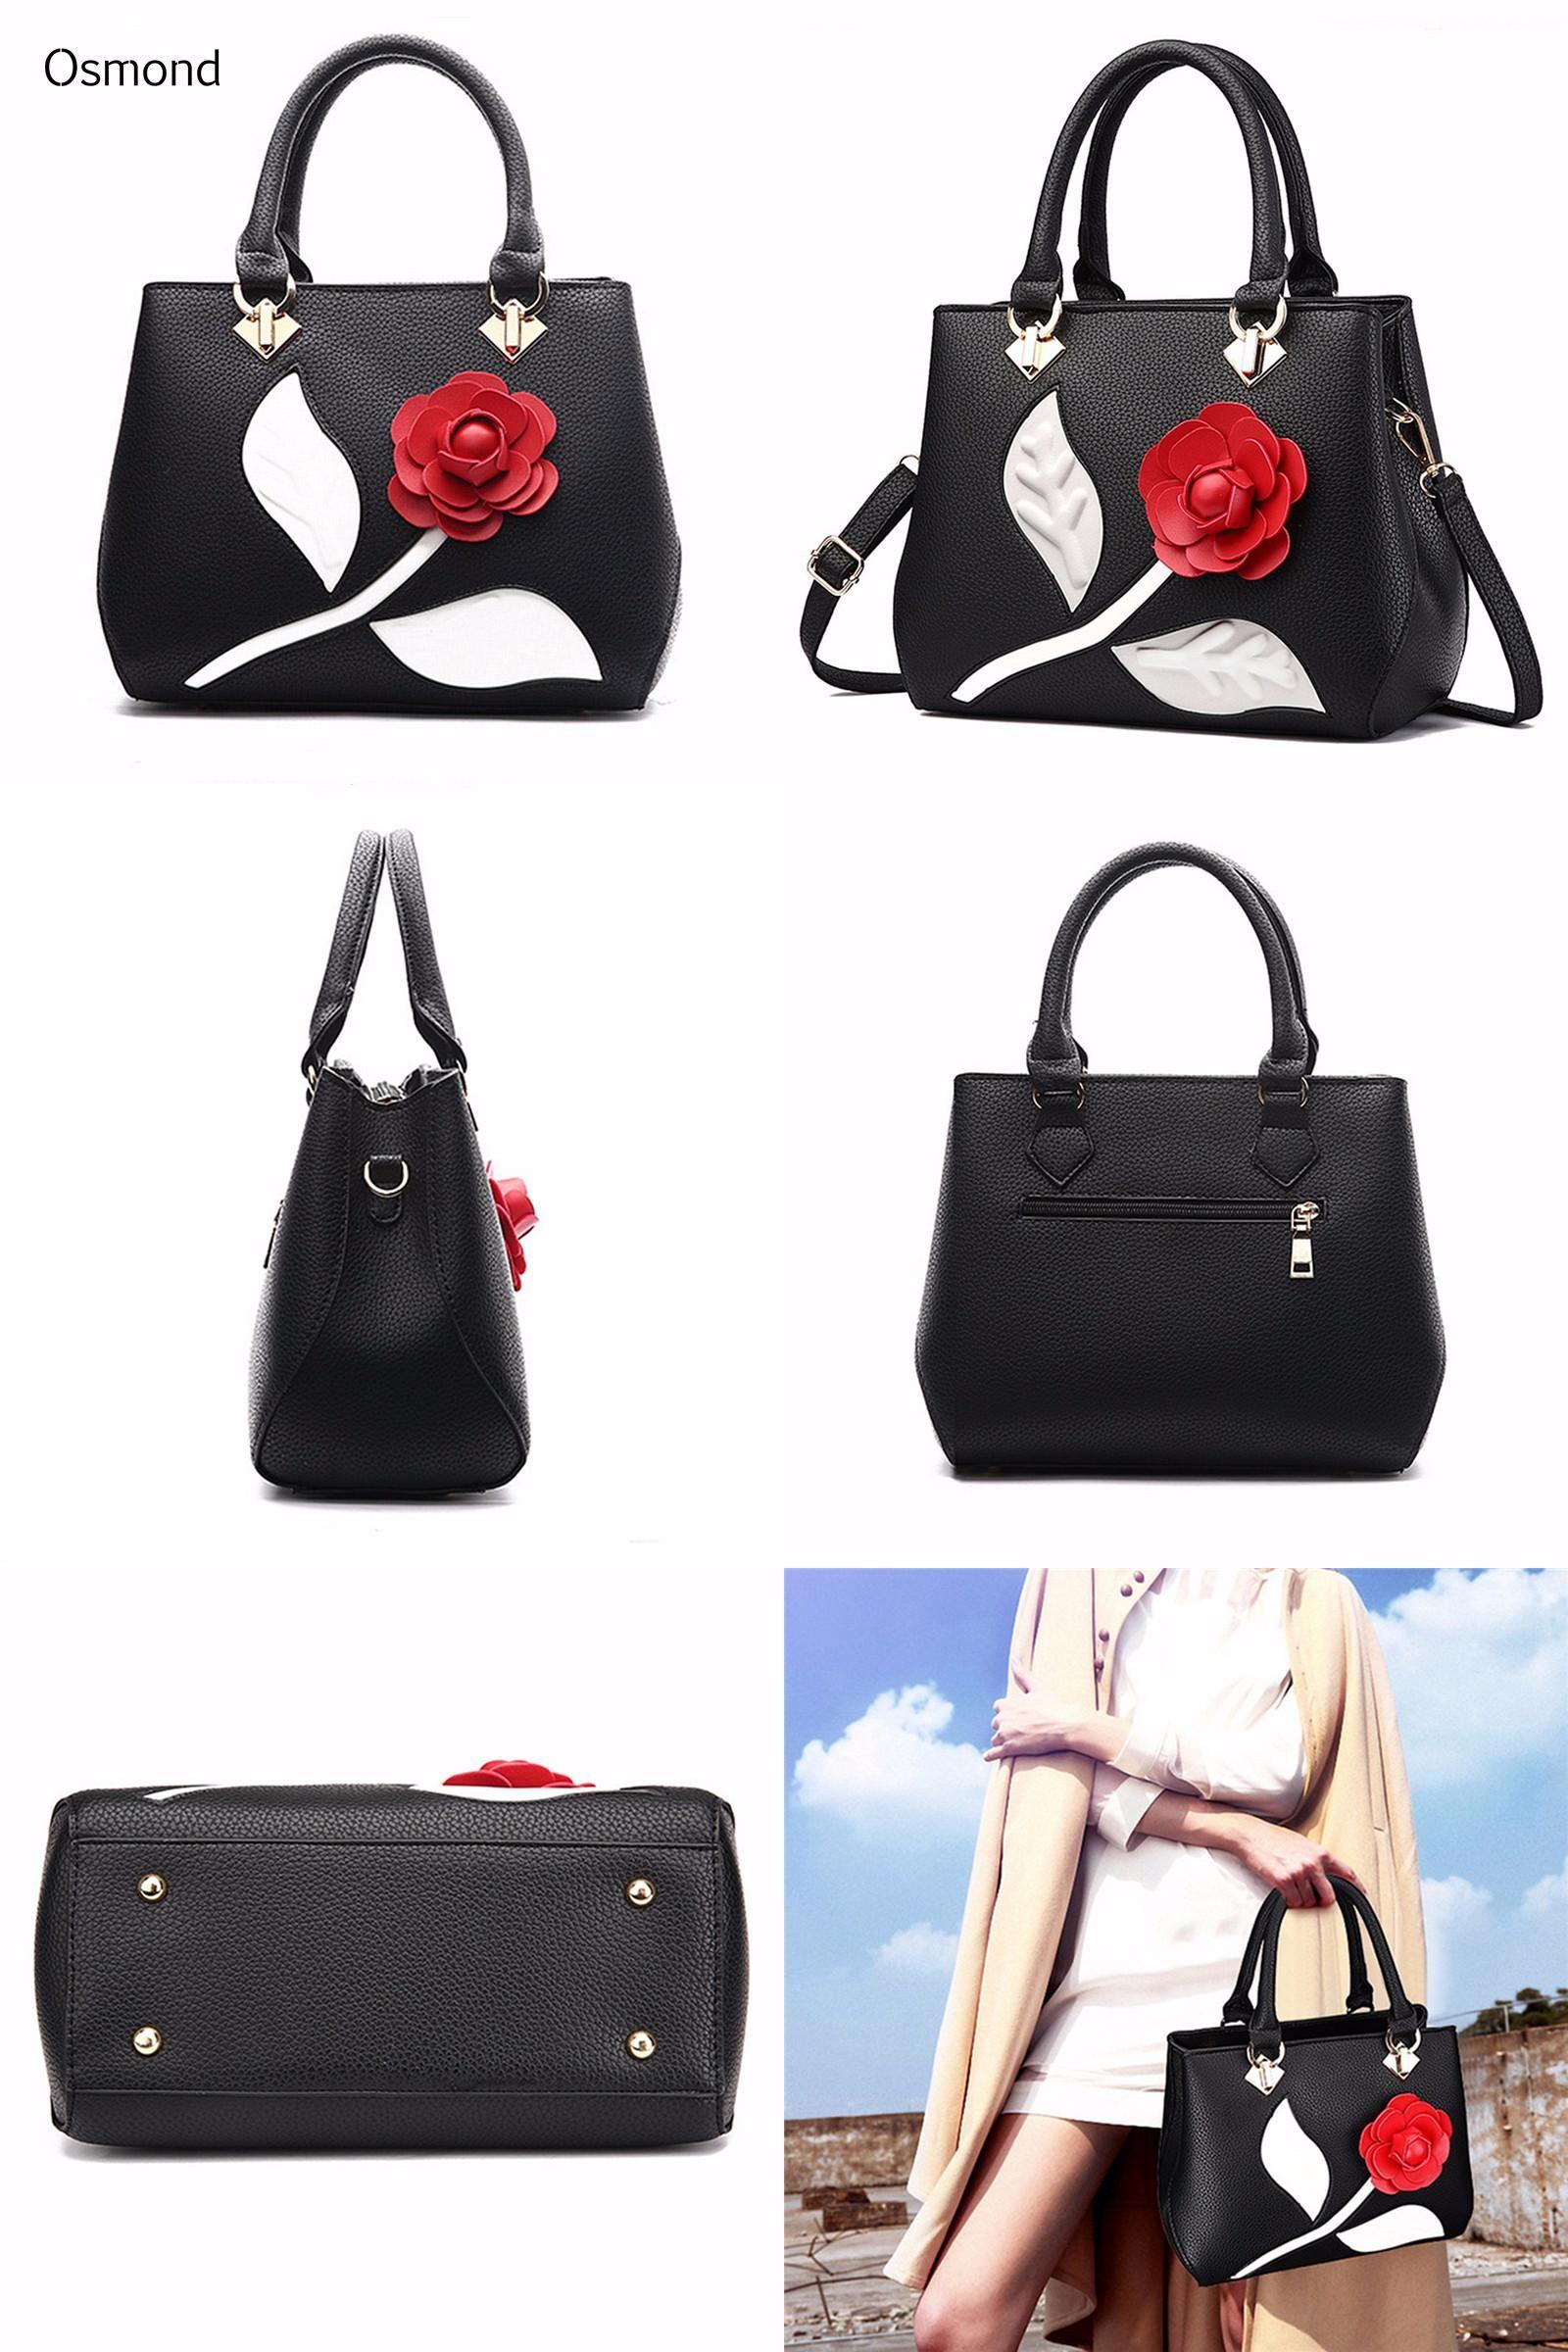 b776aa9dca72  Visit to Buy  Osmond National Vintage Embroidery Shoulder Bag Women 3D  Floral Handbags Ladies